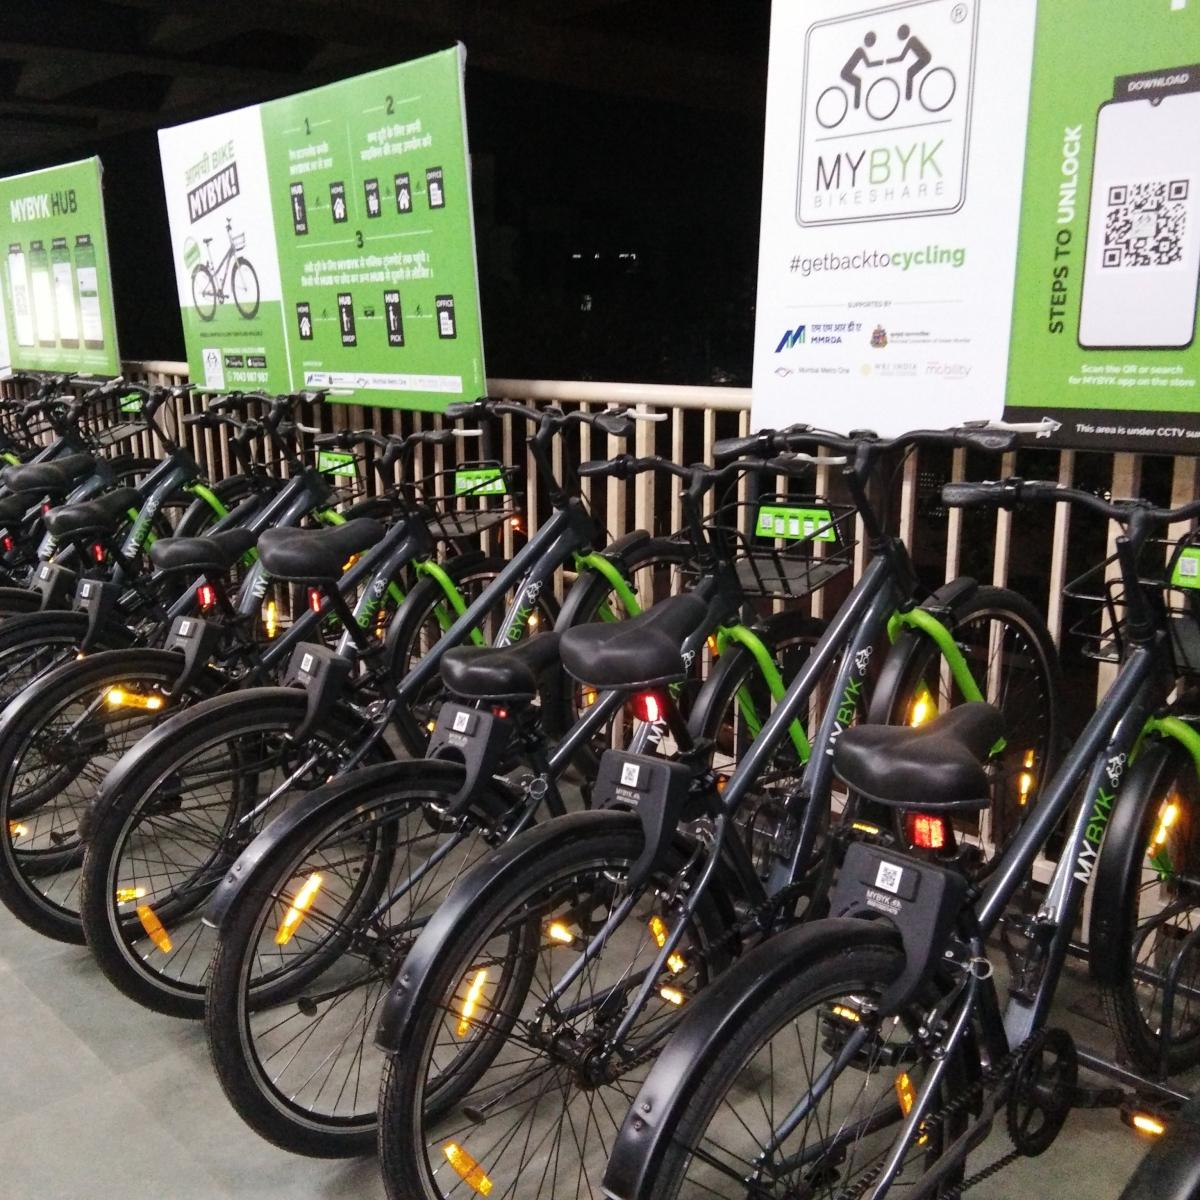 Mumbai: 'Rent a cycle' launched at Jagruti Nagar Metro station; 45 rides reported on day 1